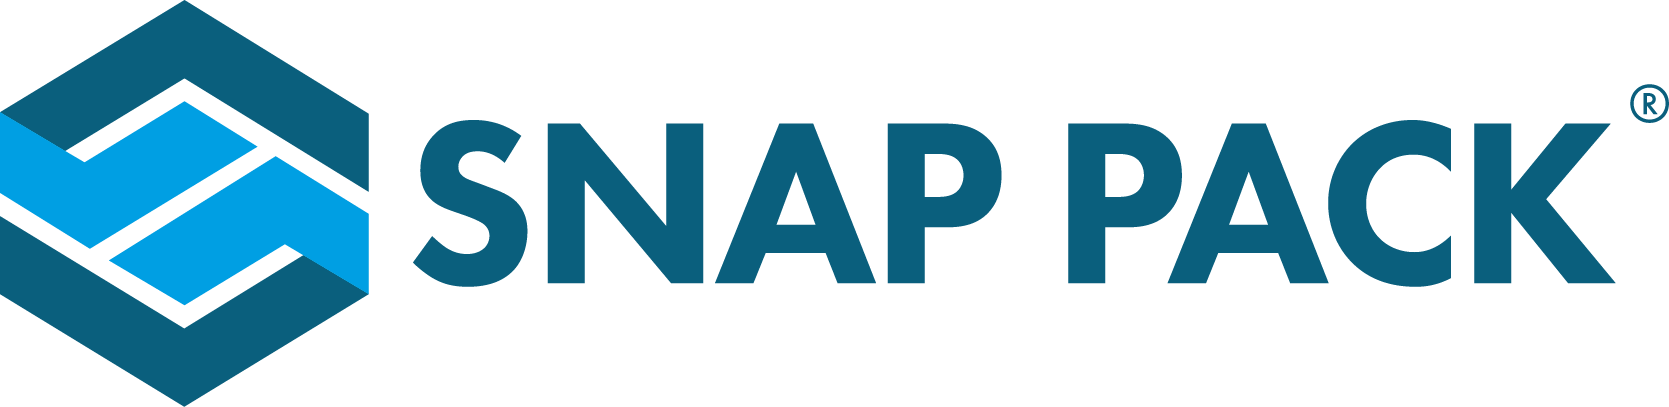 Snap-Pack-logo-breddeformat-1